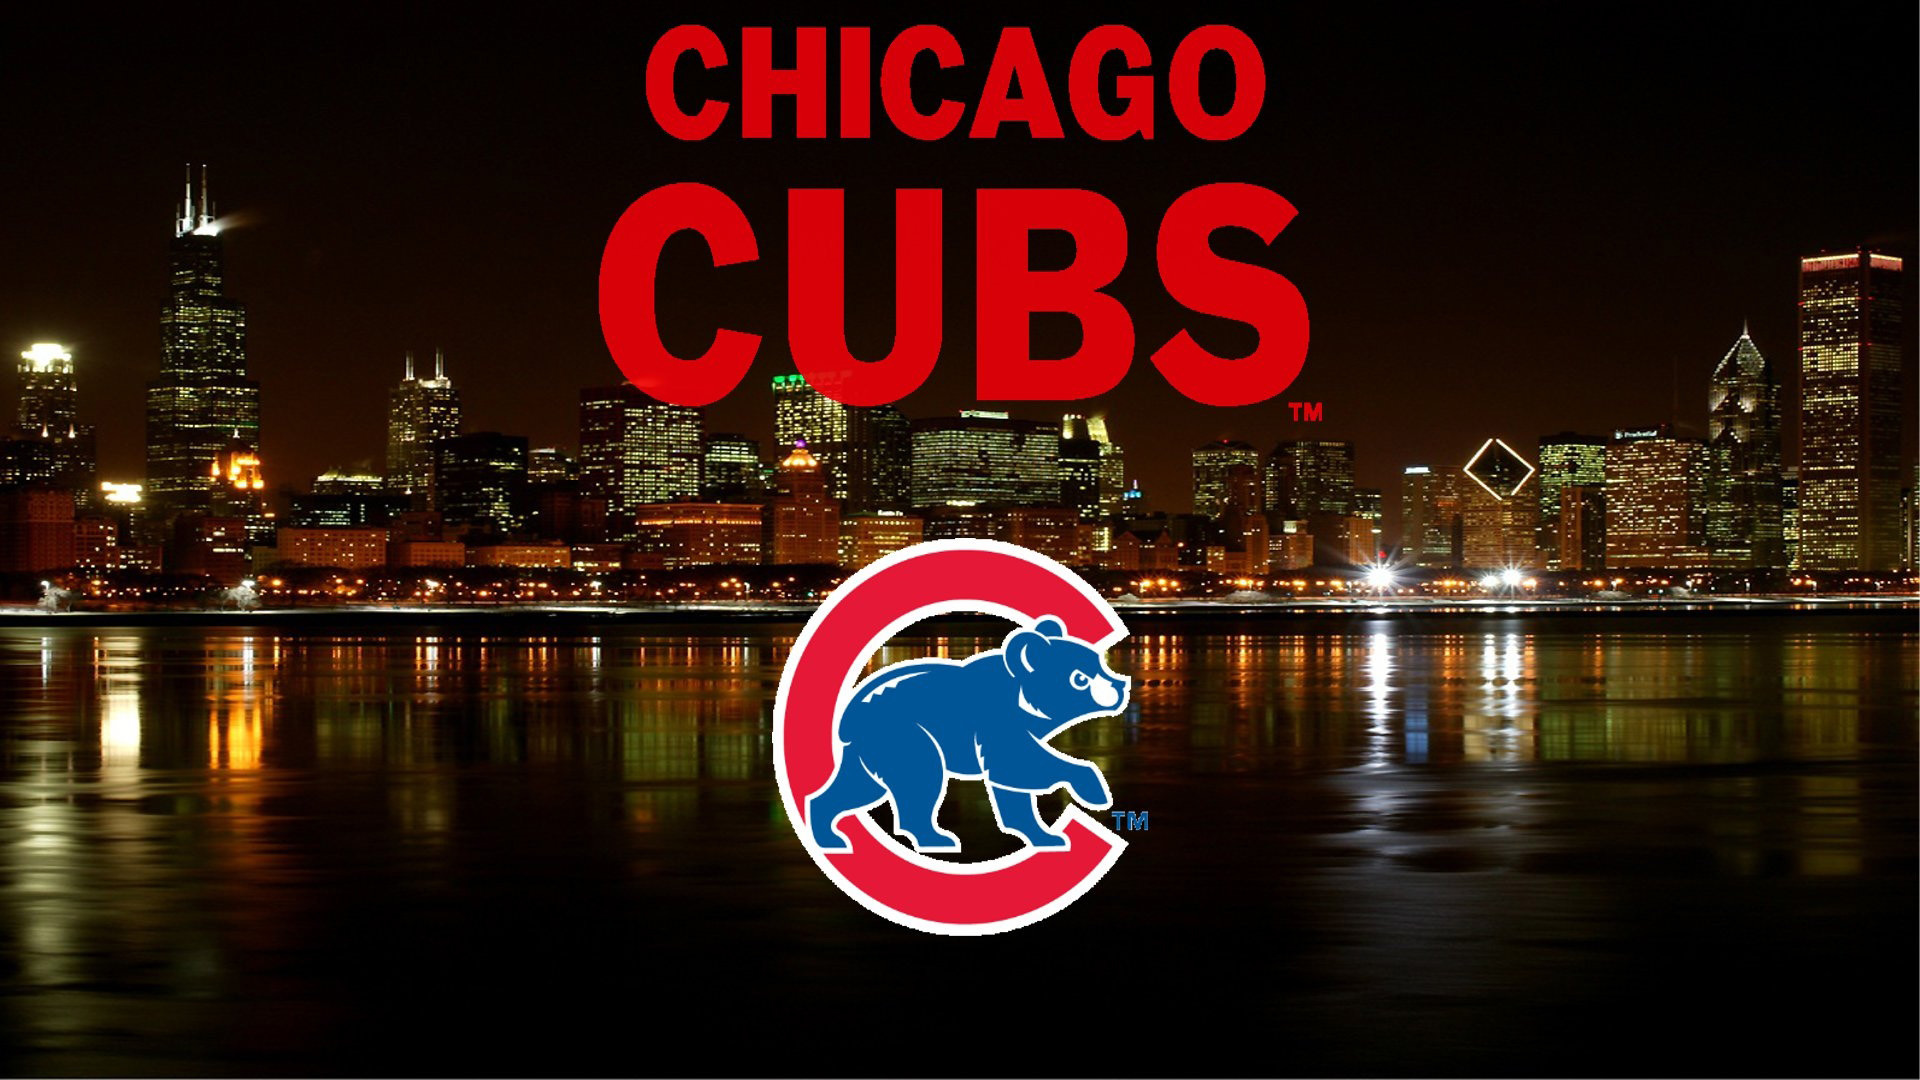 Chicago Cubs Hd Desktop